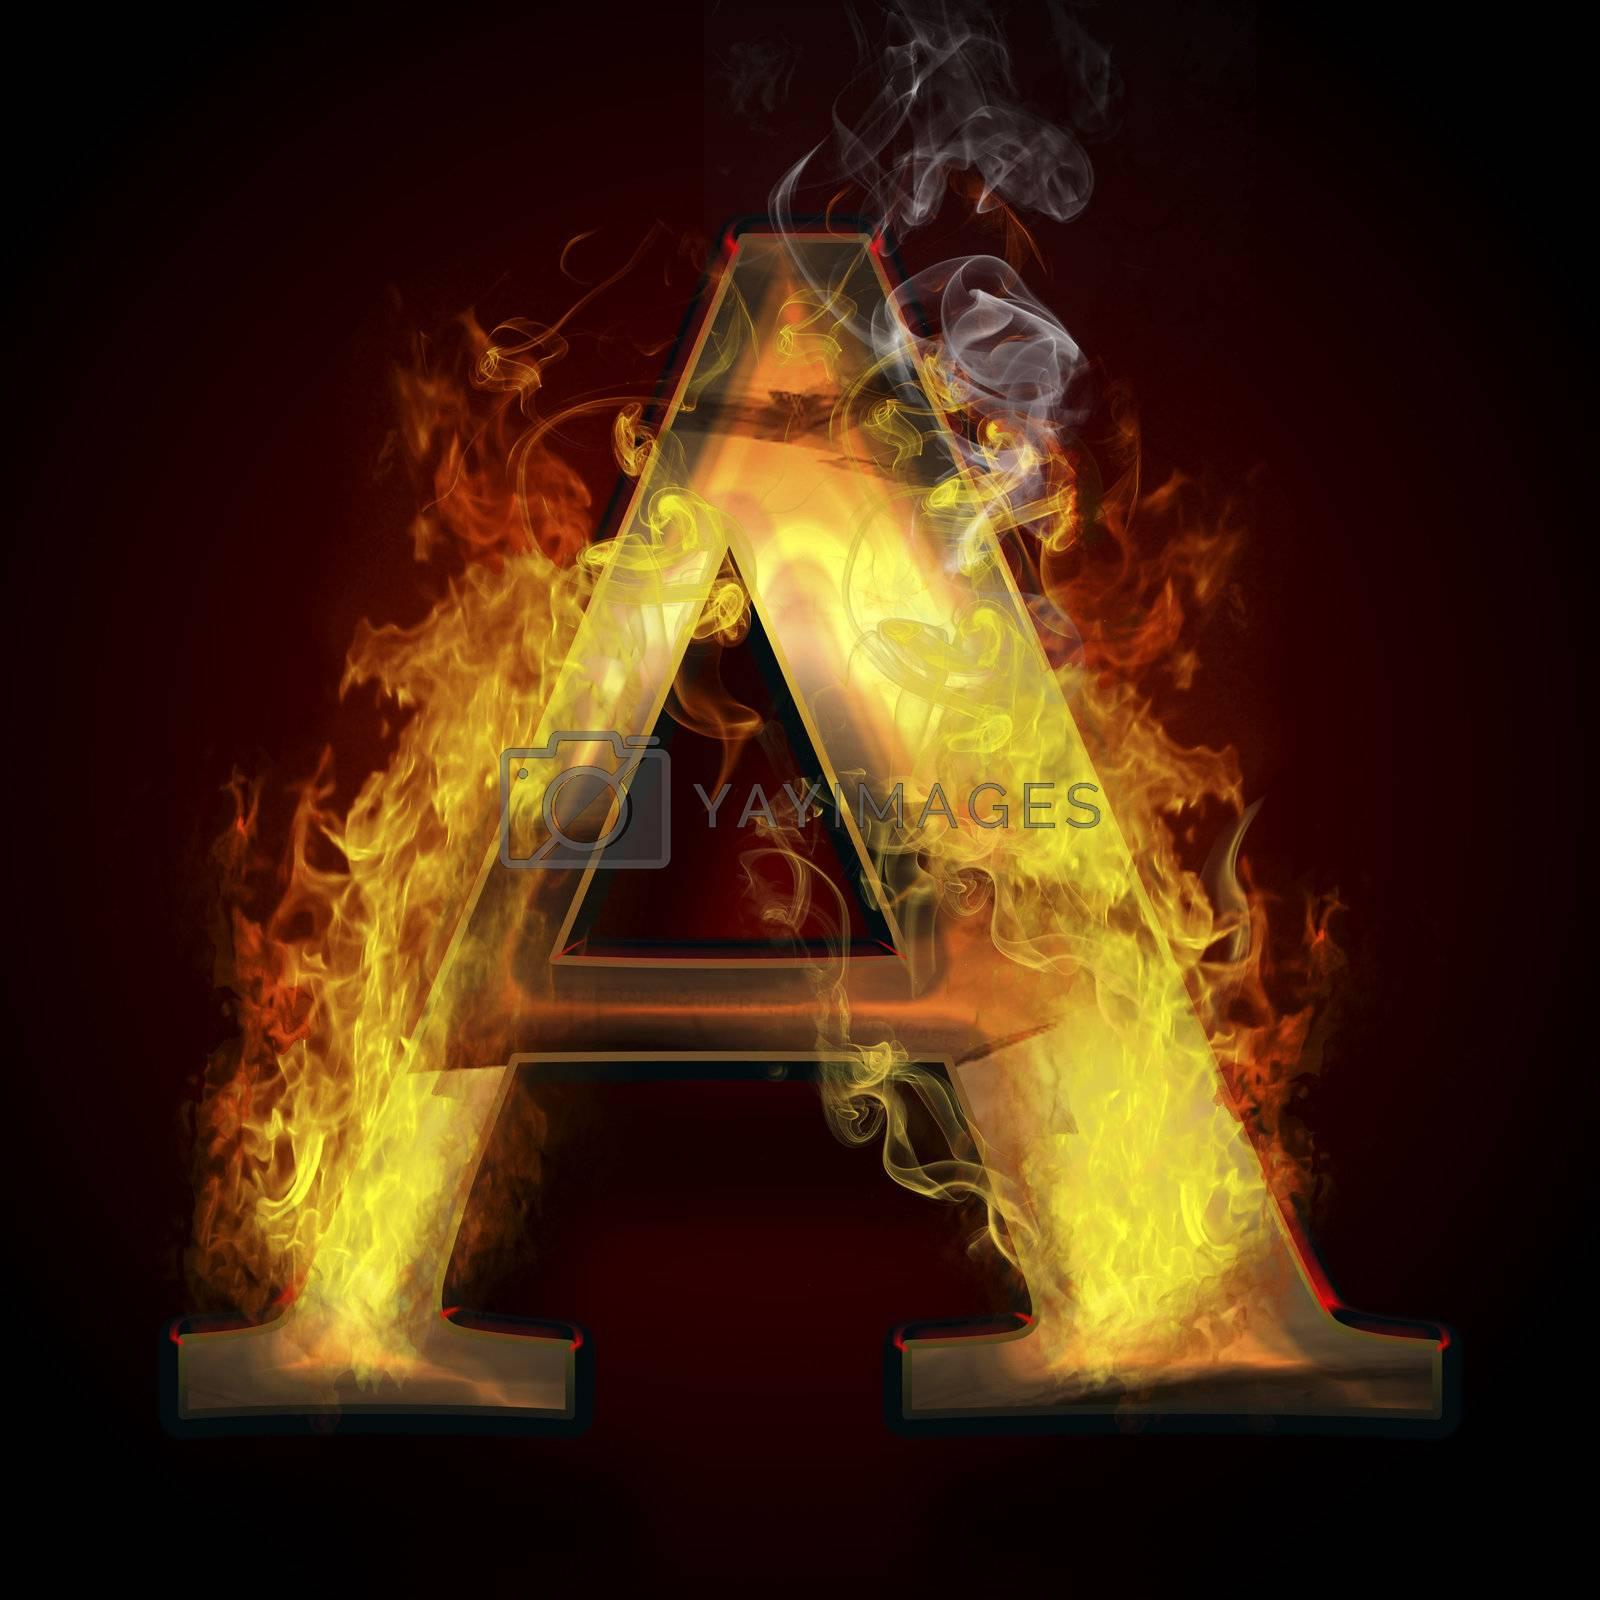 A, fire letter illustration